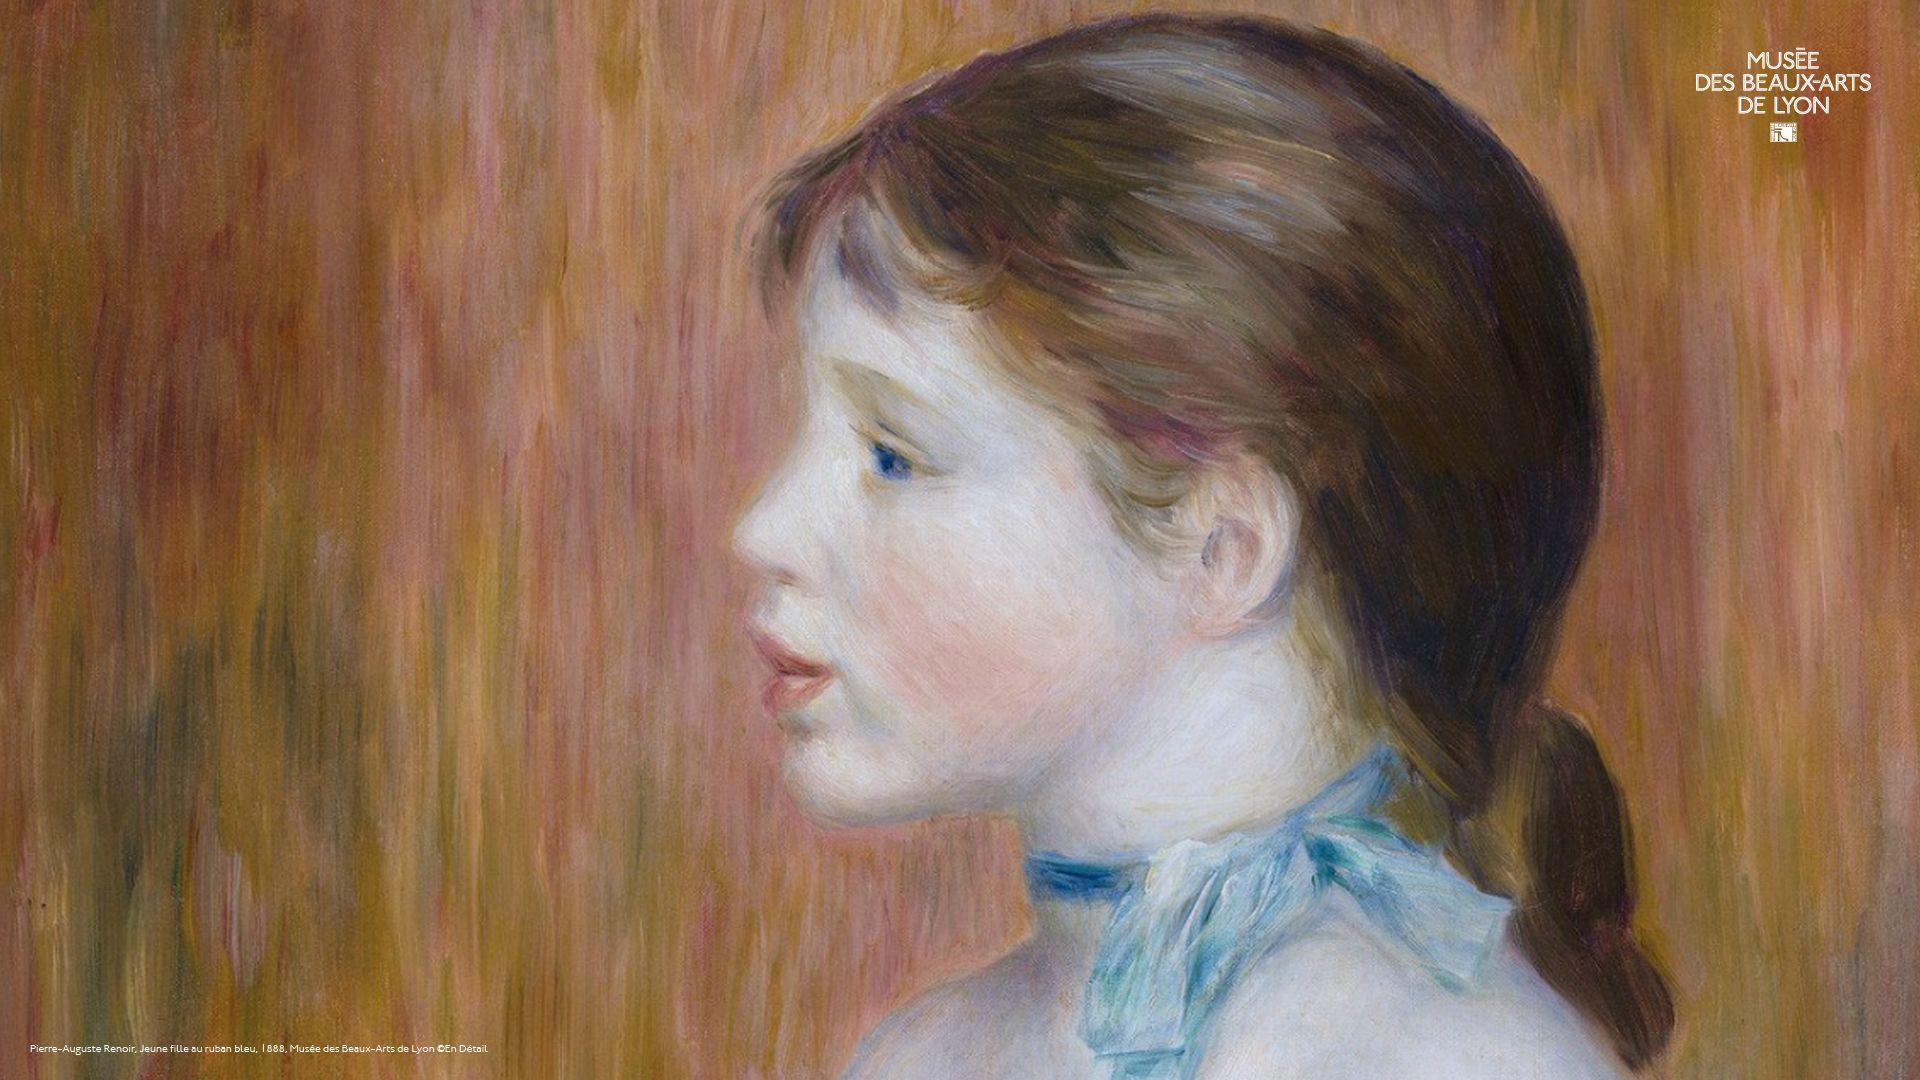 Jeune fille au ruban bleu, PierreAuguste Renoir. 1888